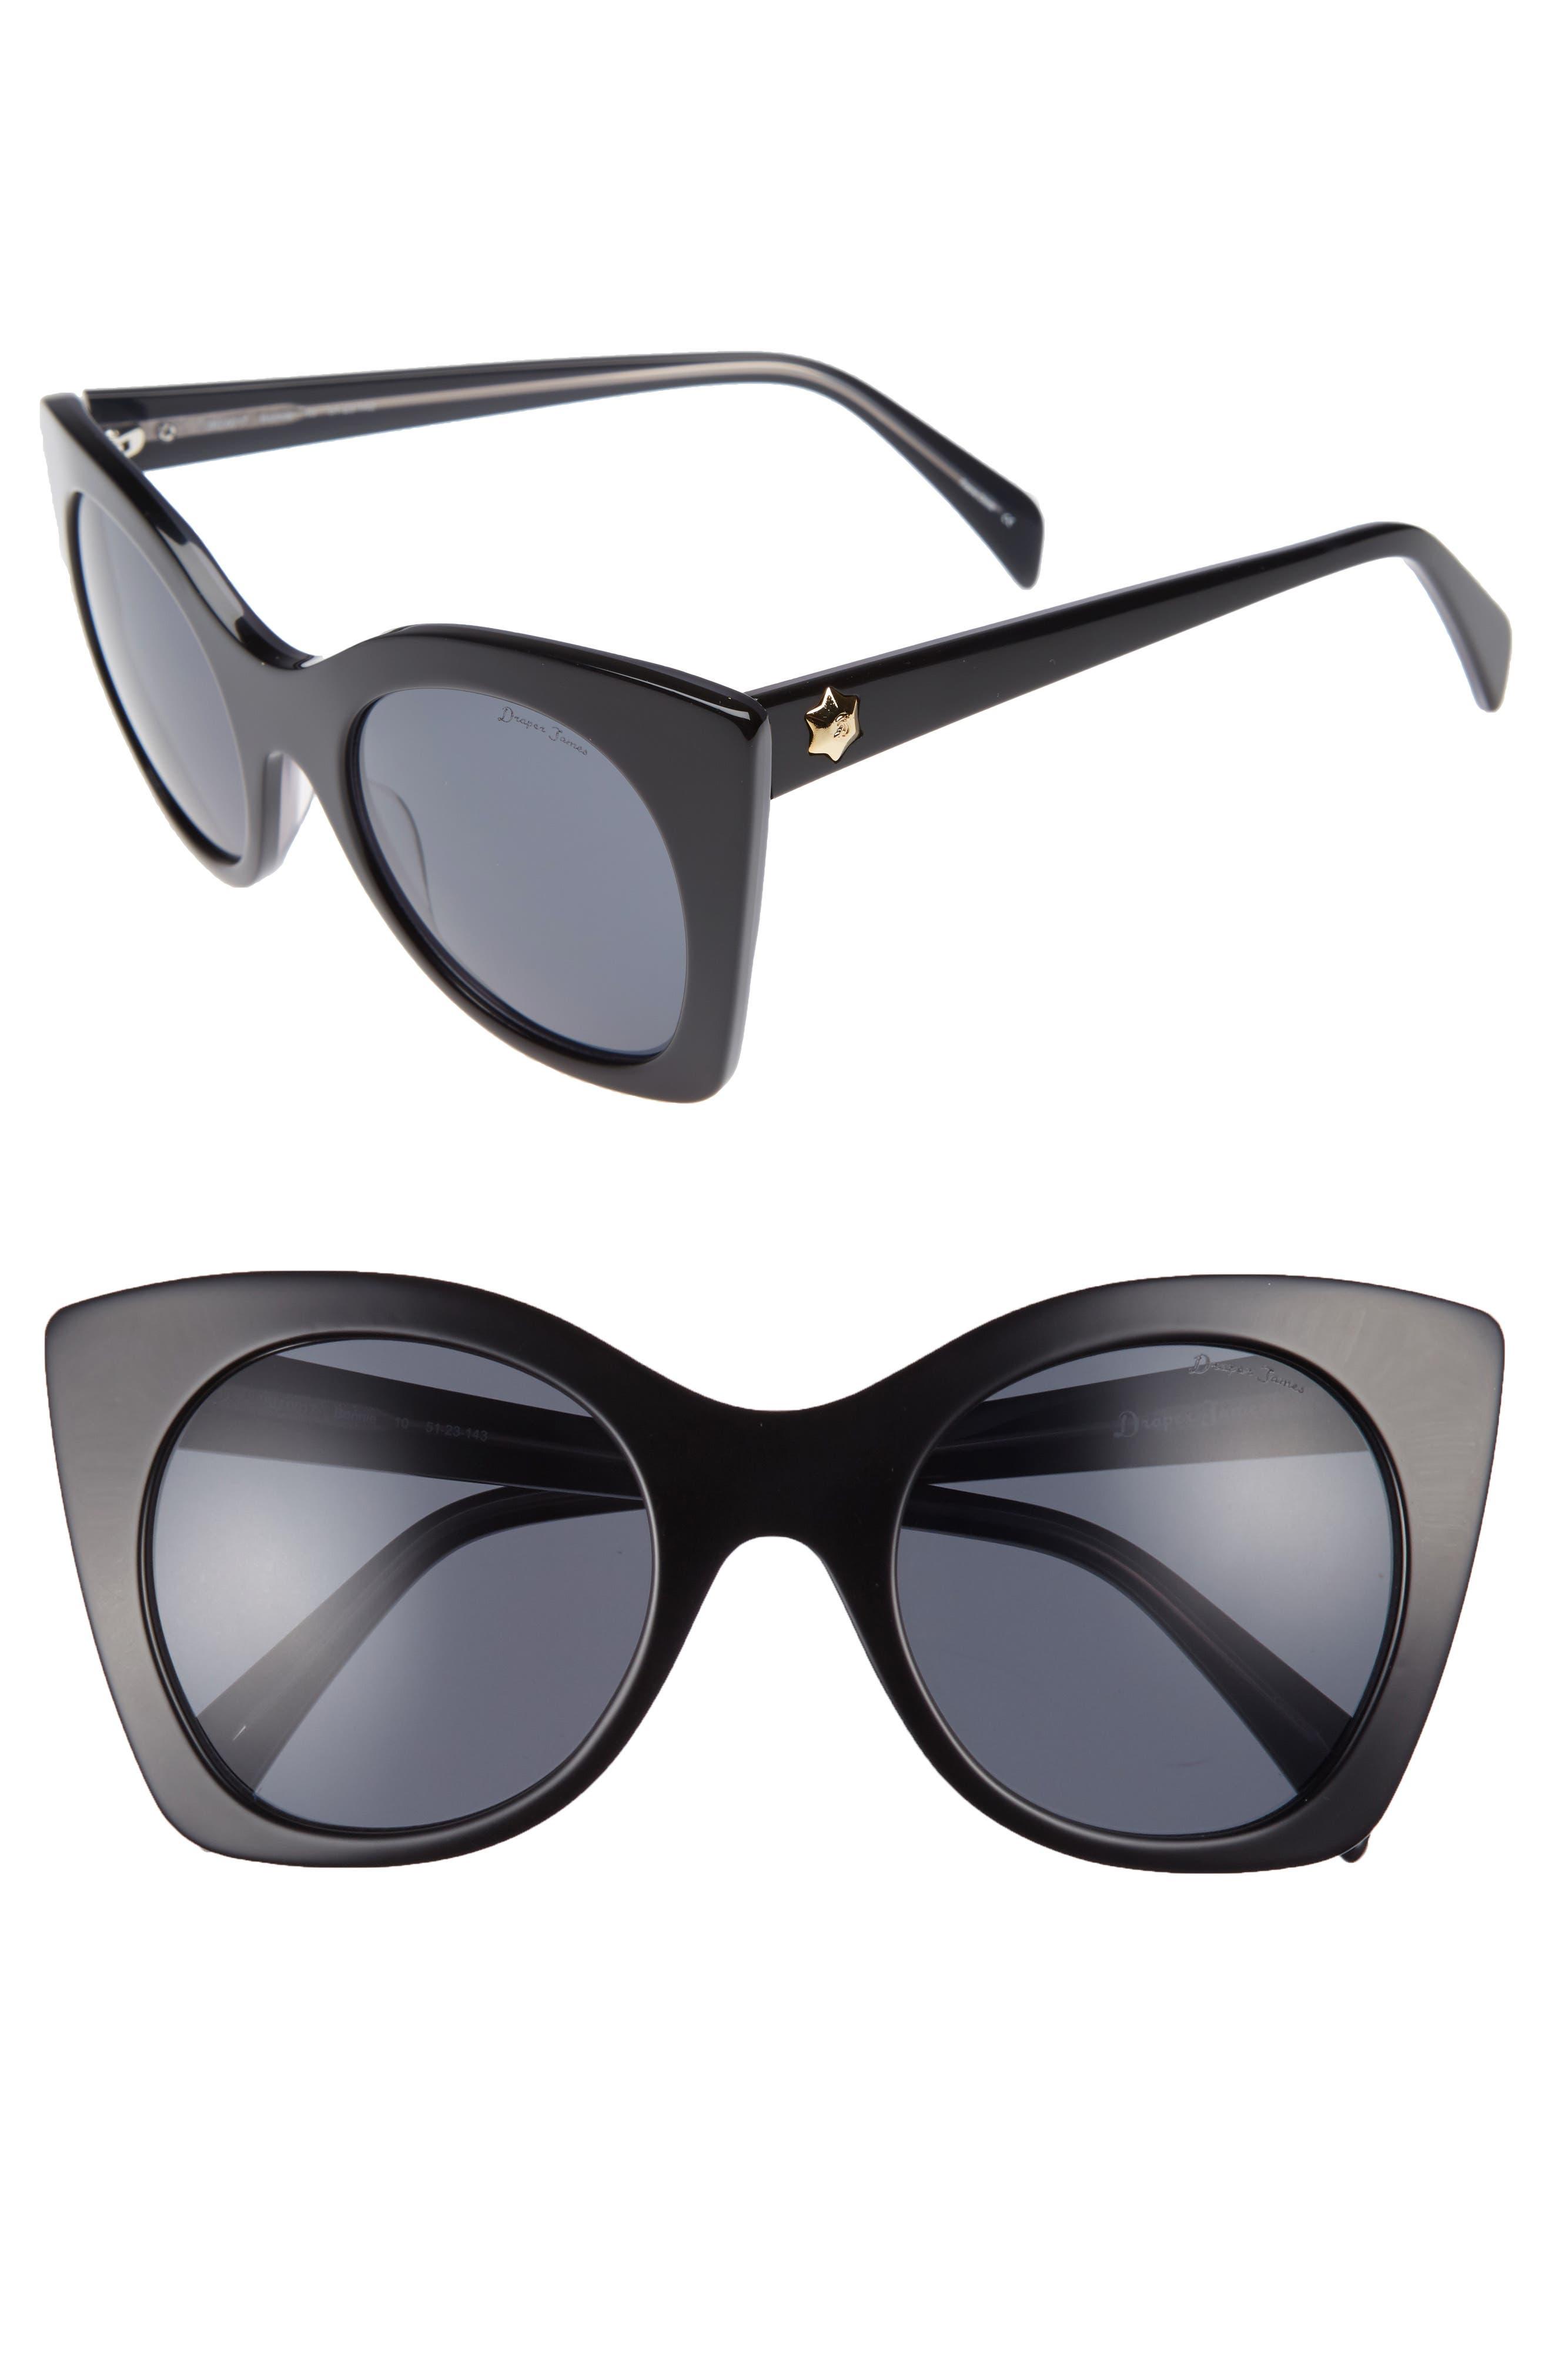 DRAPER JAMES 51mm Geometric Sunglasses, Main, color, 001